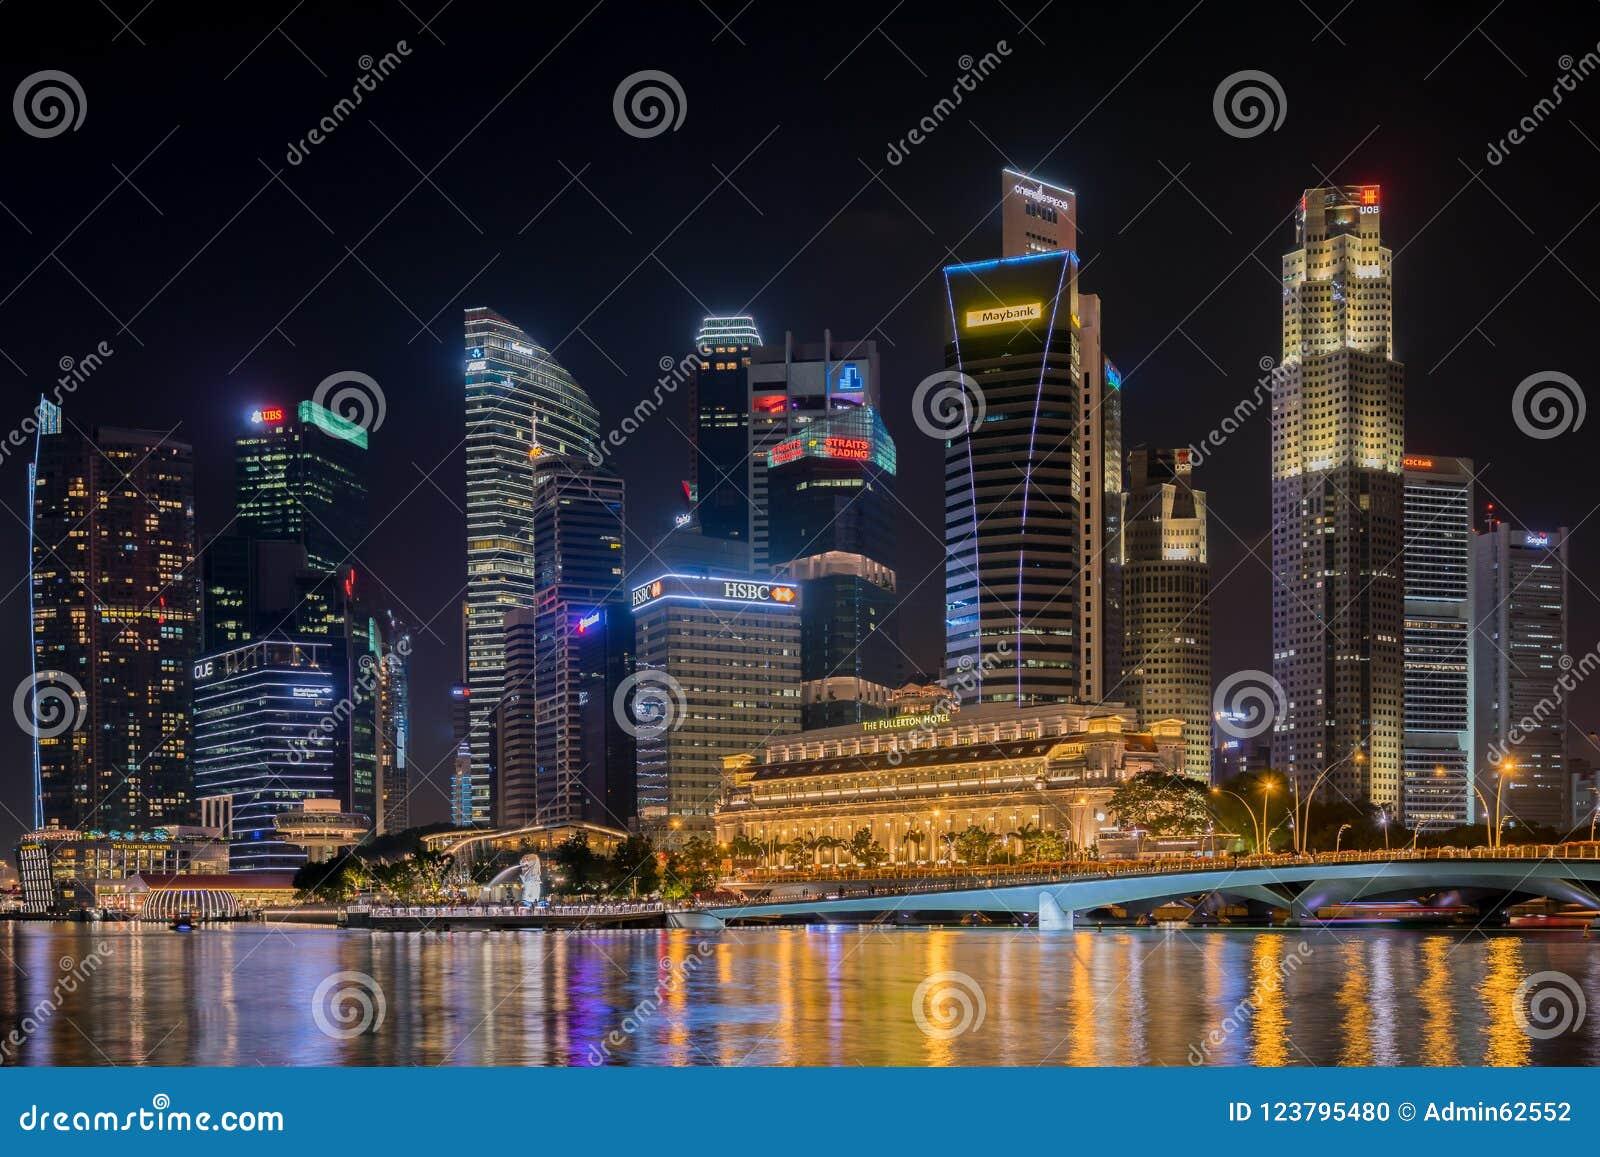 Zentrales Geschäftsgebiet Singapurs am 19. November 2016